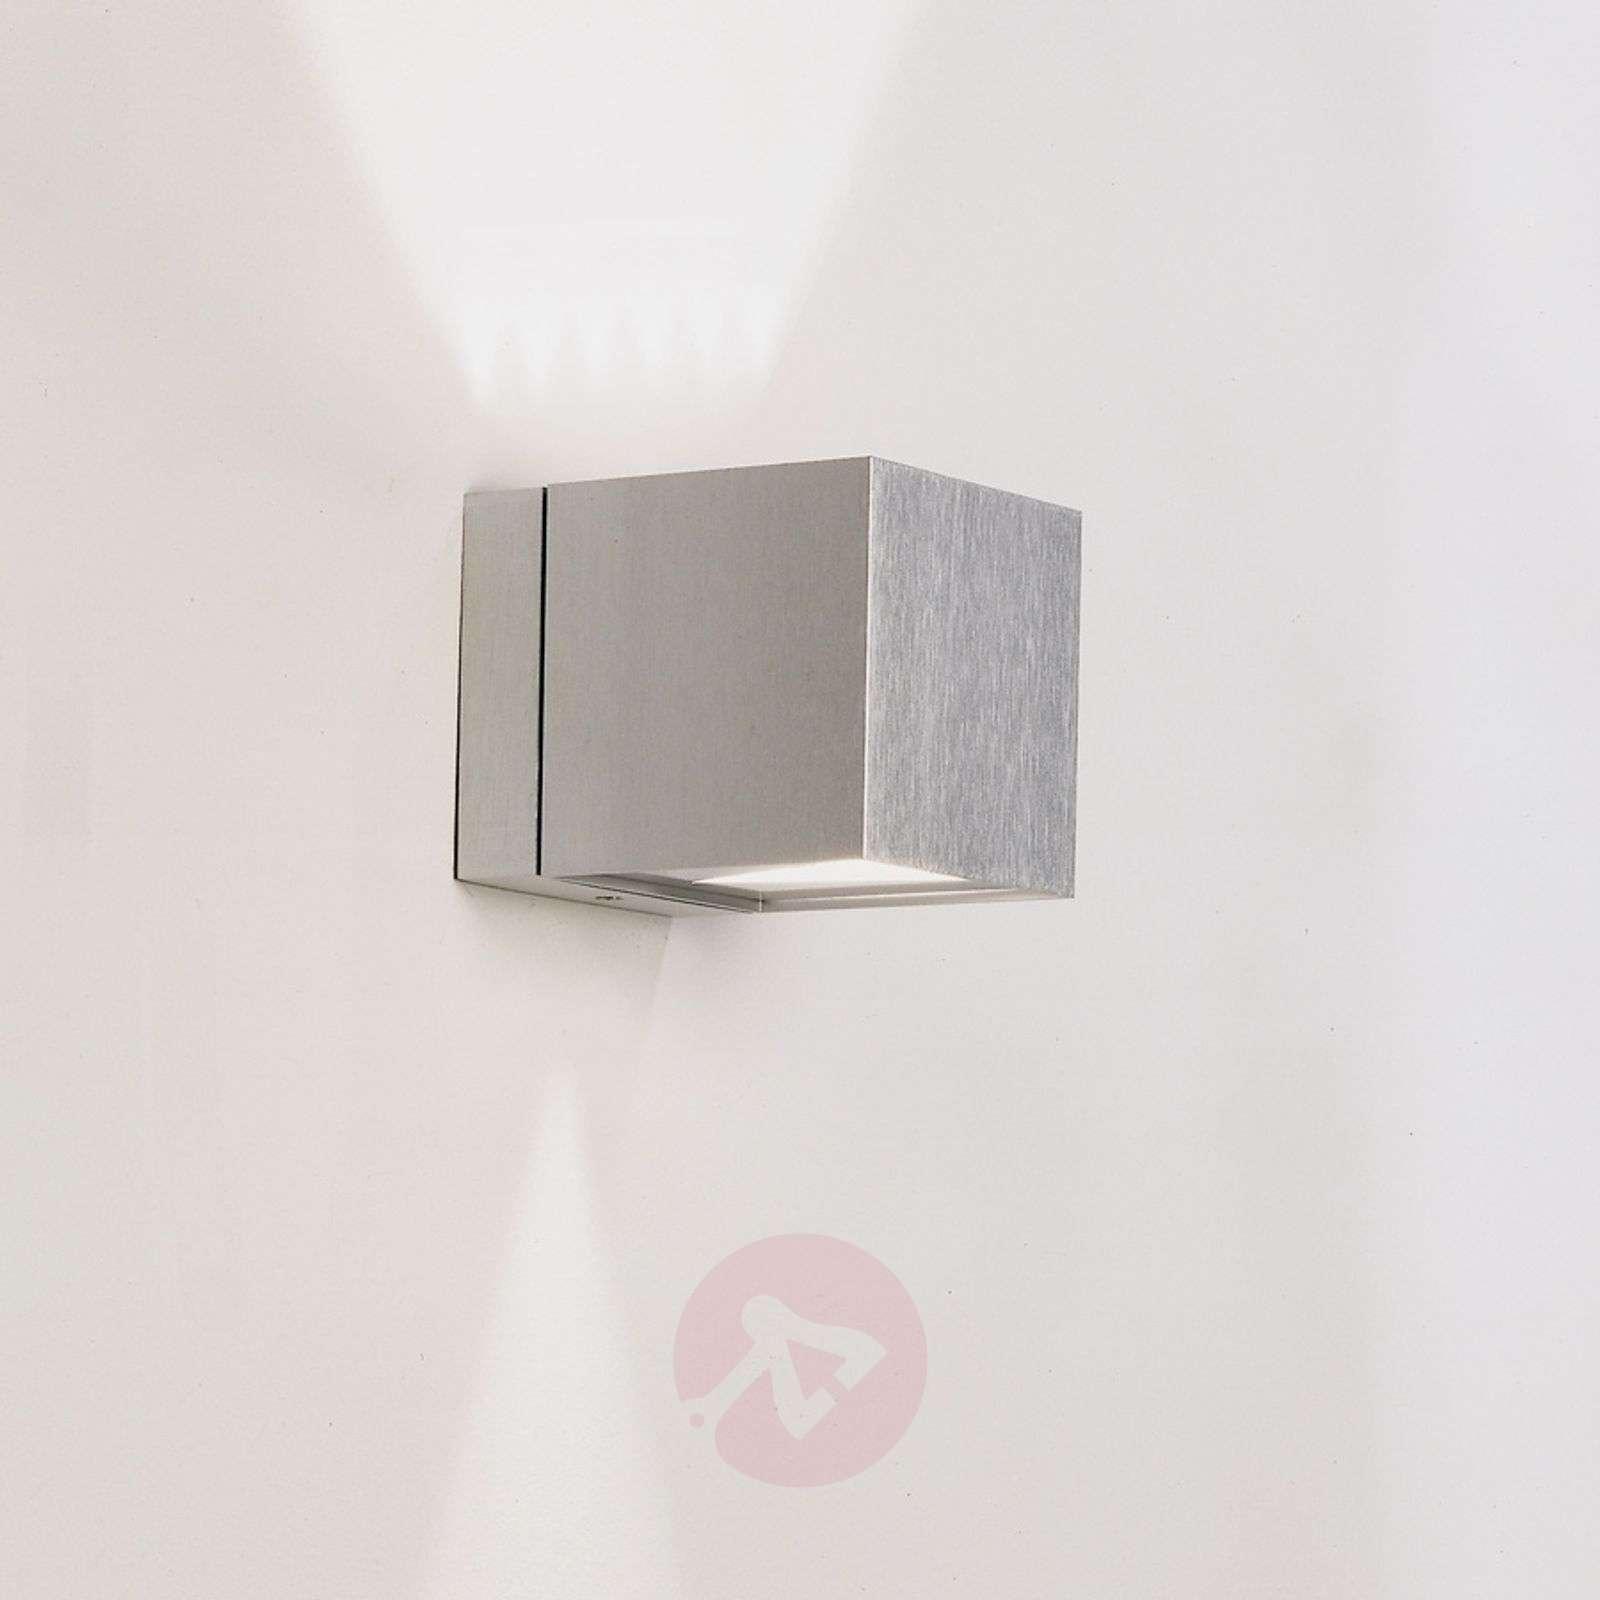 Dau cube wall light lights dau cube wall light in aluminium 6708073 01 aloadofball Image collections